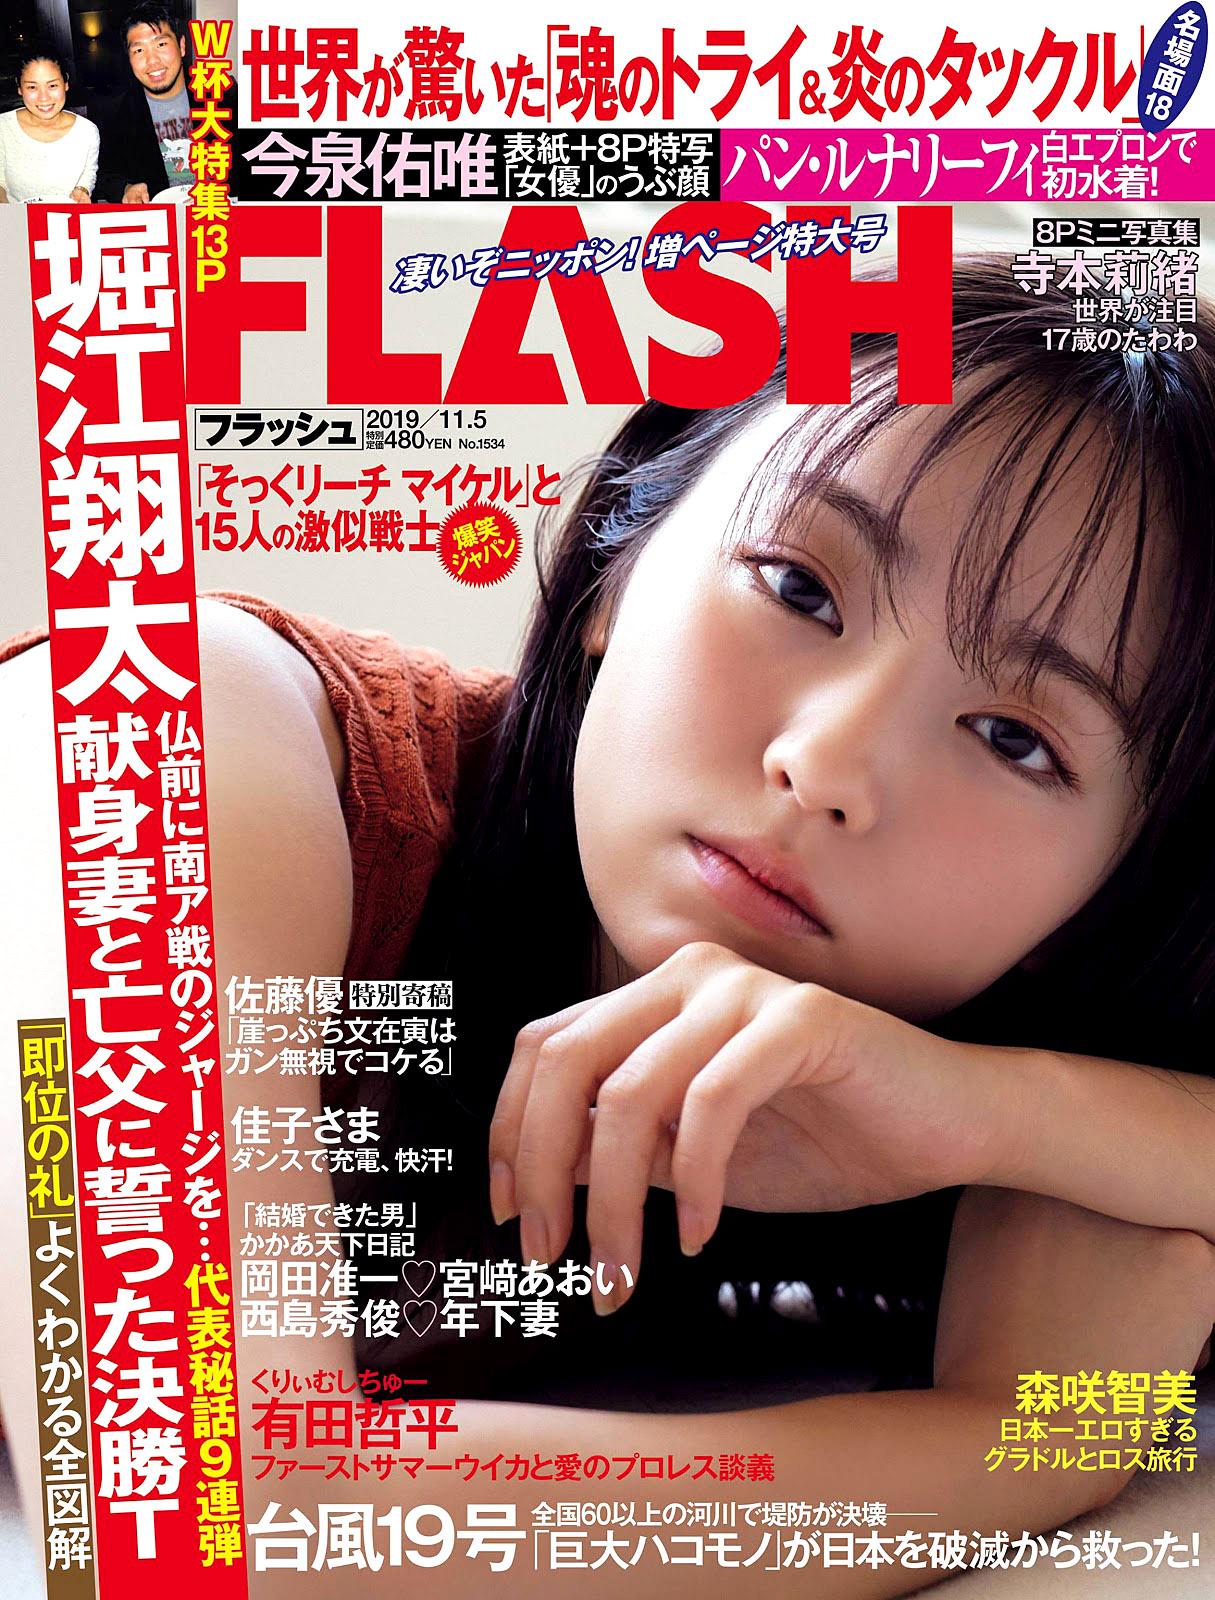 Yui Imaizumi Flash 191105 01.jpg